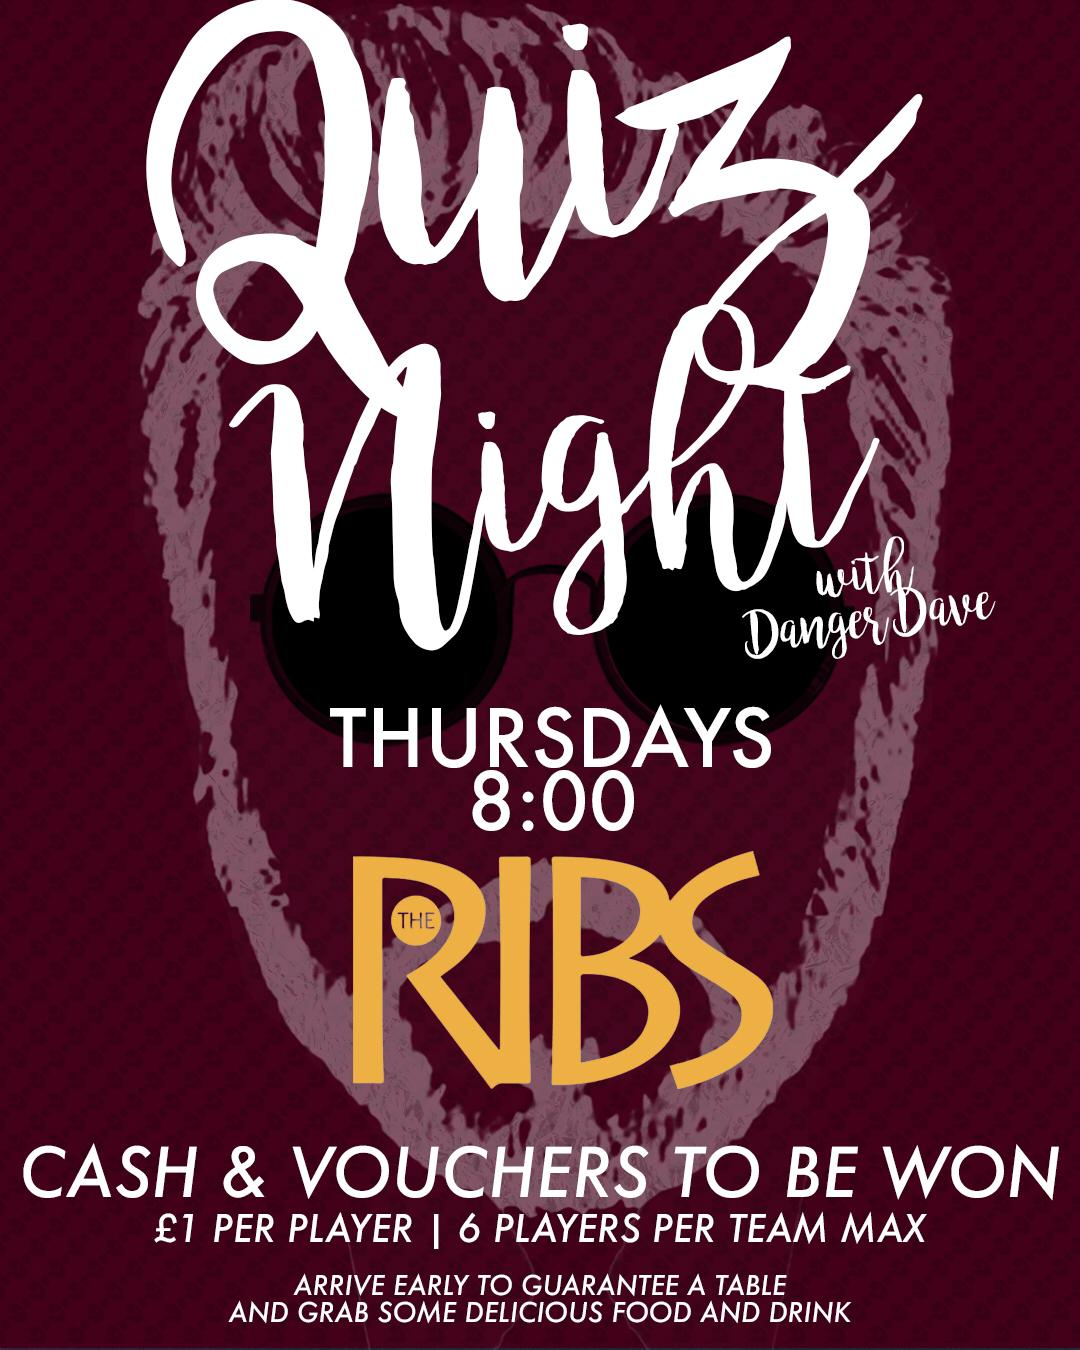 Ribs Quiz night - every Thursday at 8pm.